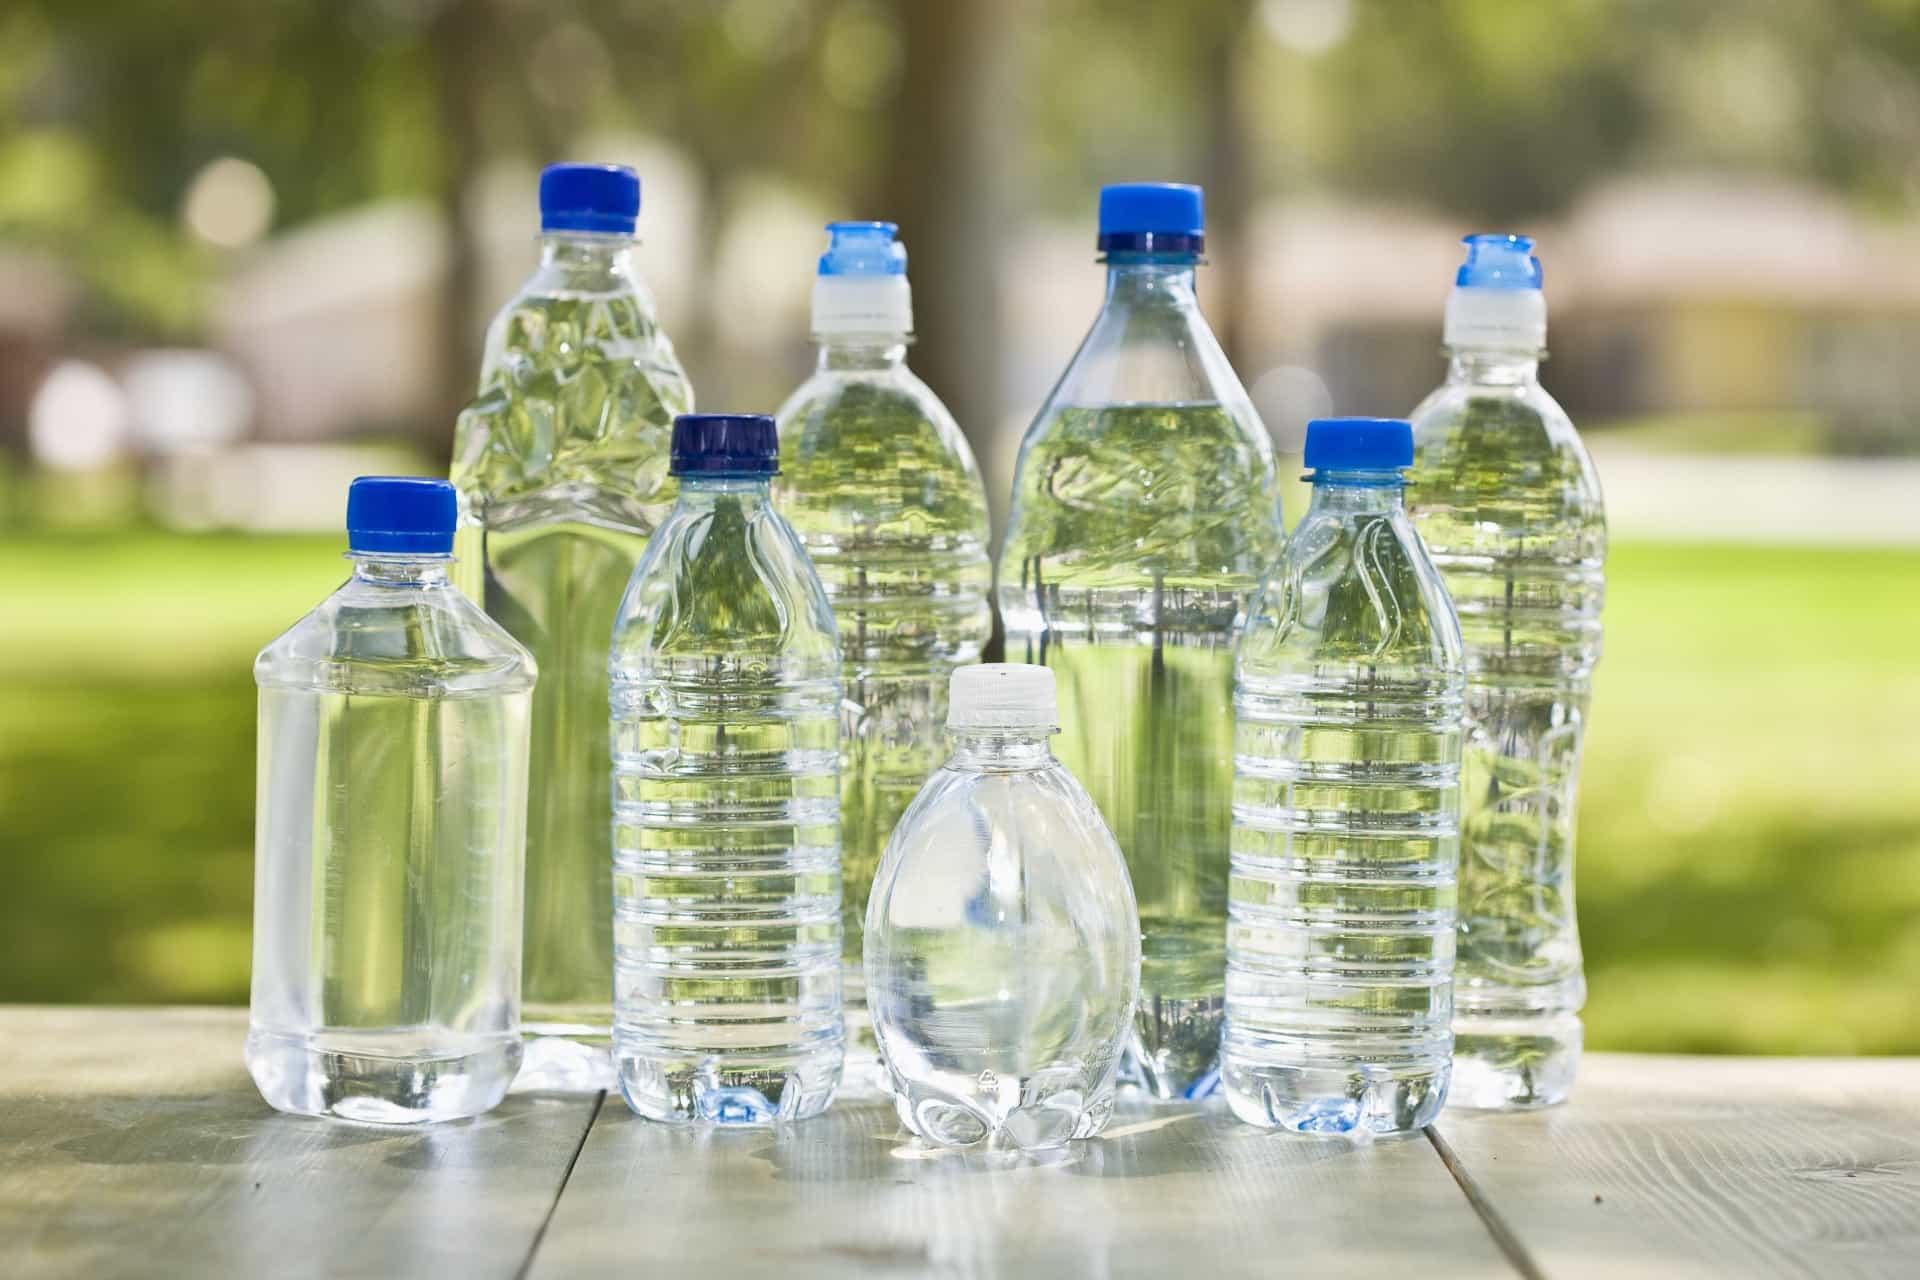 Три пути к устойчивому замкнутому циклу пластиков в Европе